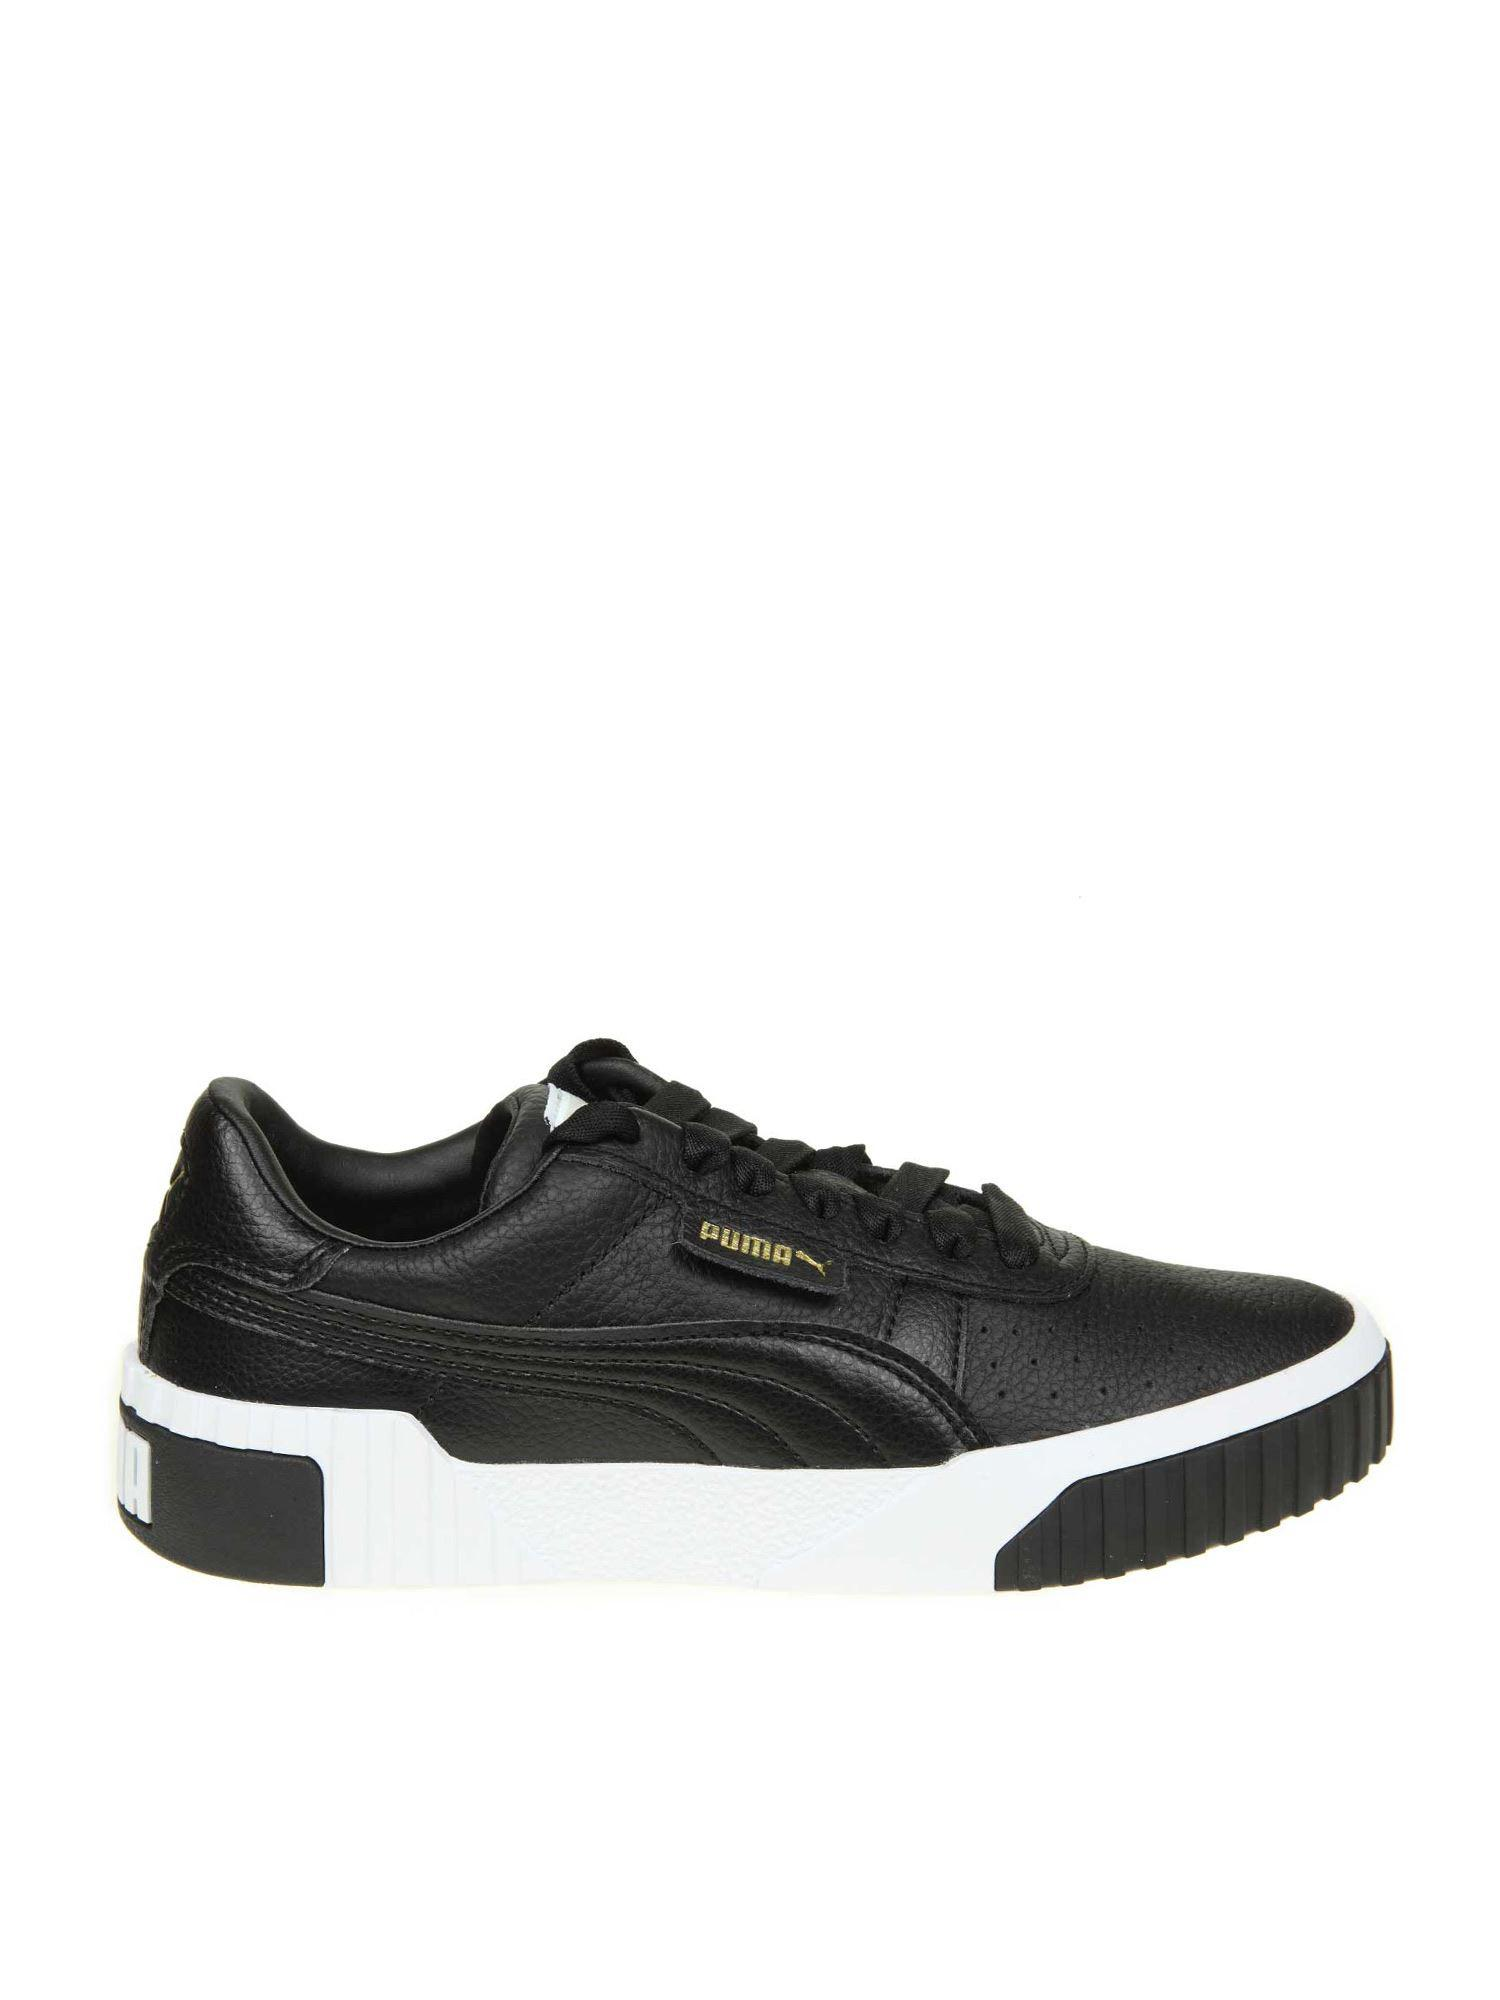 PUMA Leather Cali Wn's Black Sneakers - Lyst